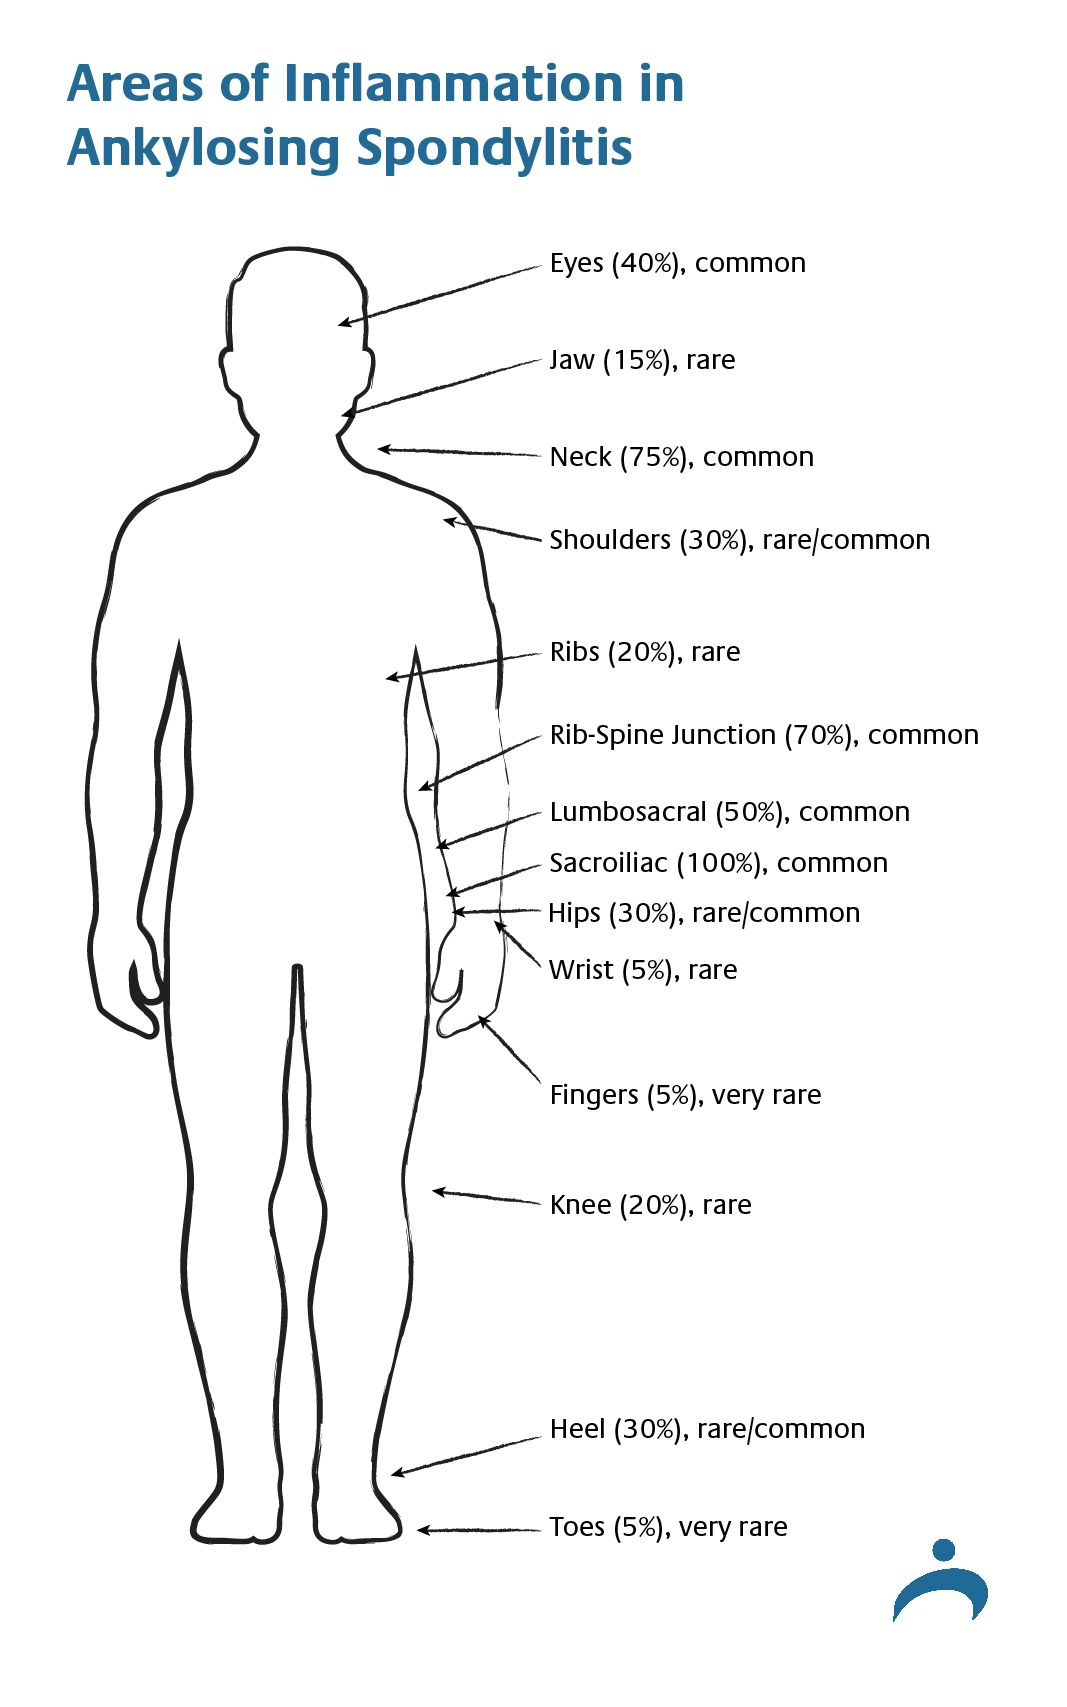 areas of inflammation in ankylosing spondylitis diagram [ 1067 x 1707 Pixel ]